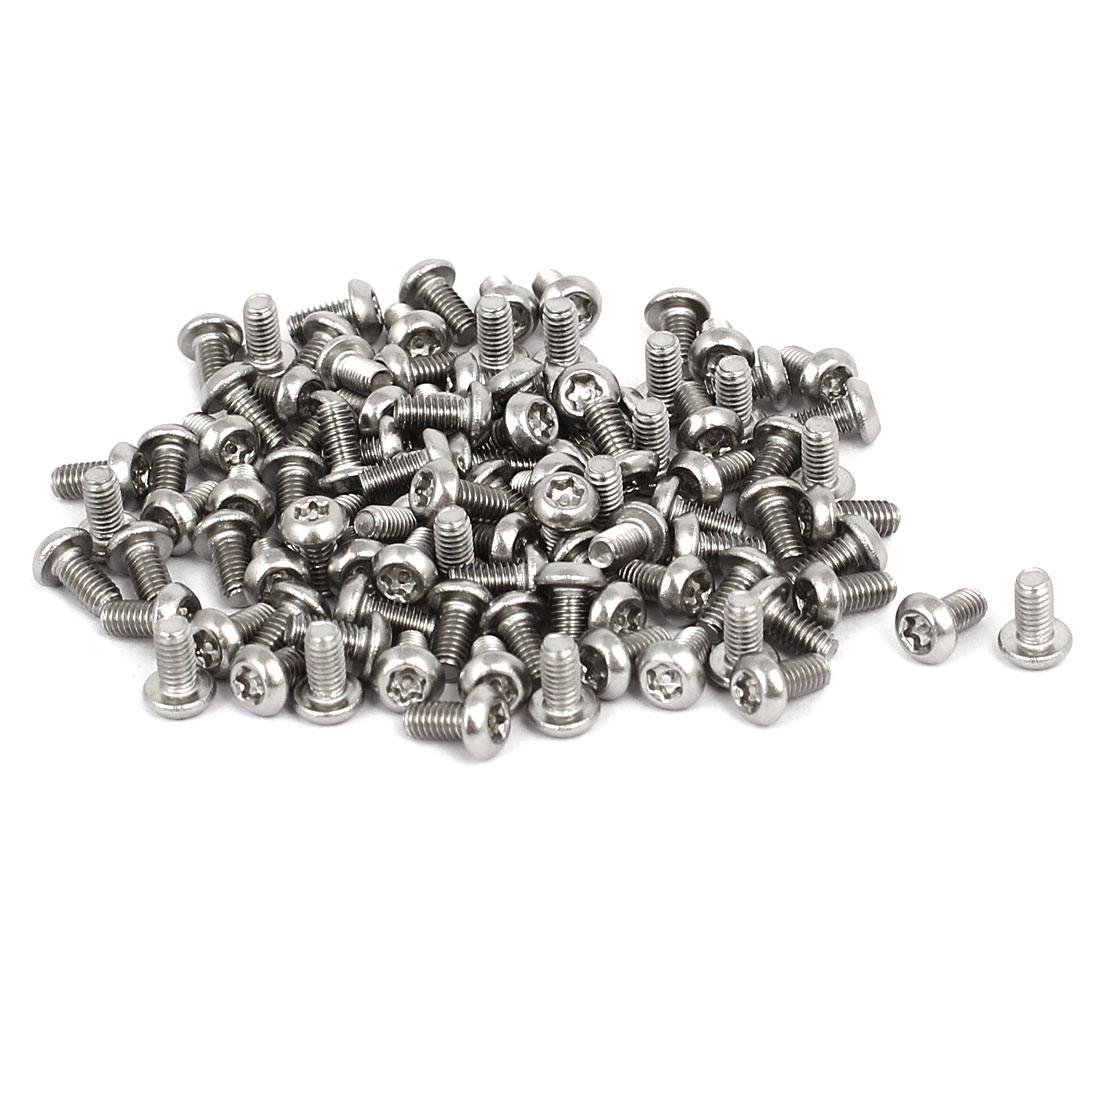 M2.5x5mm 304 Stainless Steel Button Head Torx Security Machine Screws 100pcs